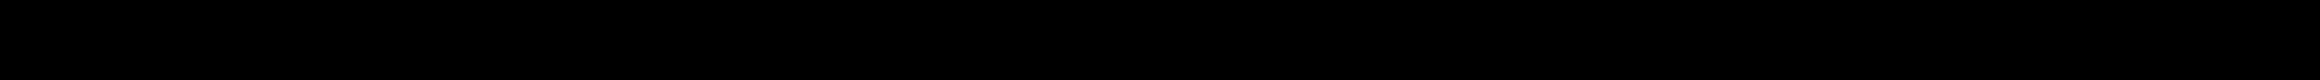 BOSCH 12 41 7 794 952, 12 41 7 796 892, 12 41 7 798 035, 12 41 7 798 036, 7794952 Startmotor / Starter